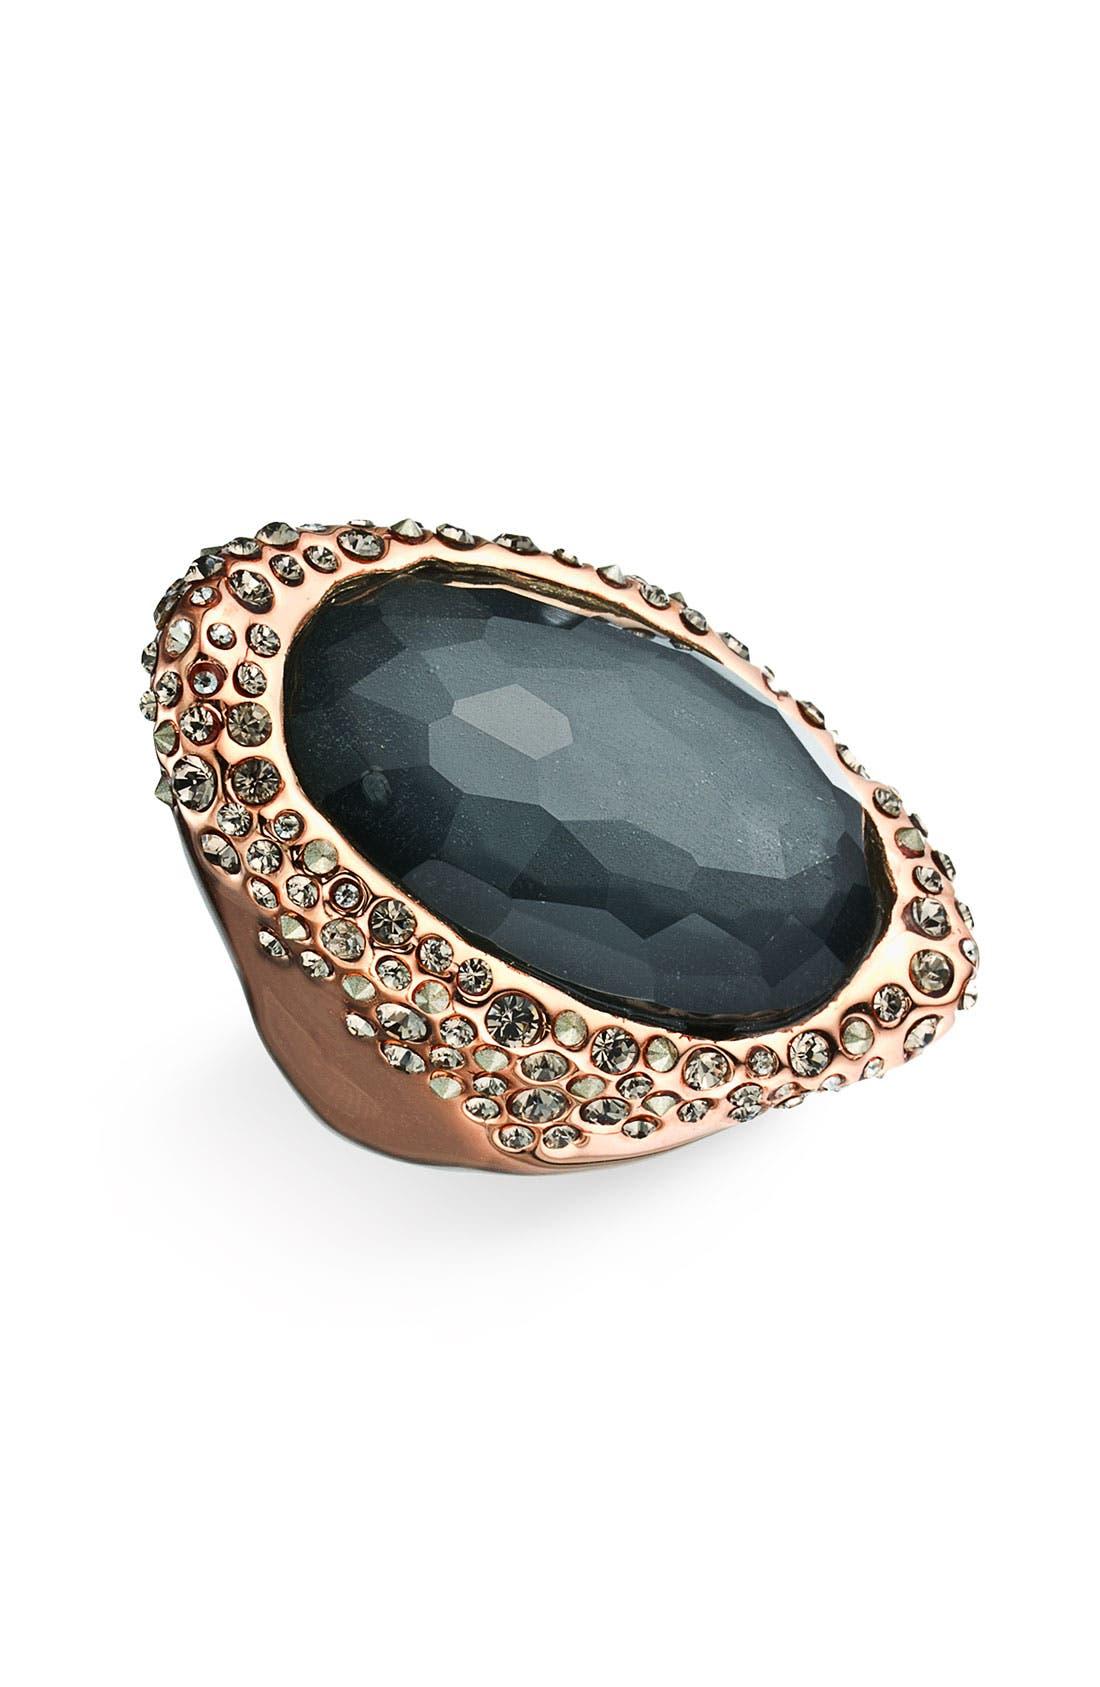 Alternate Image 1 Selected - Alexis Bittar 'Miss Havisham' Crystal Encrusted Doublet Ring